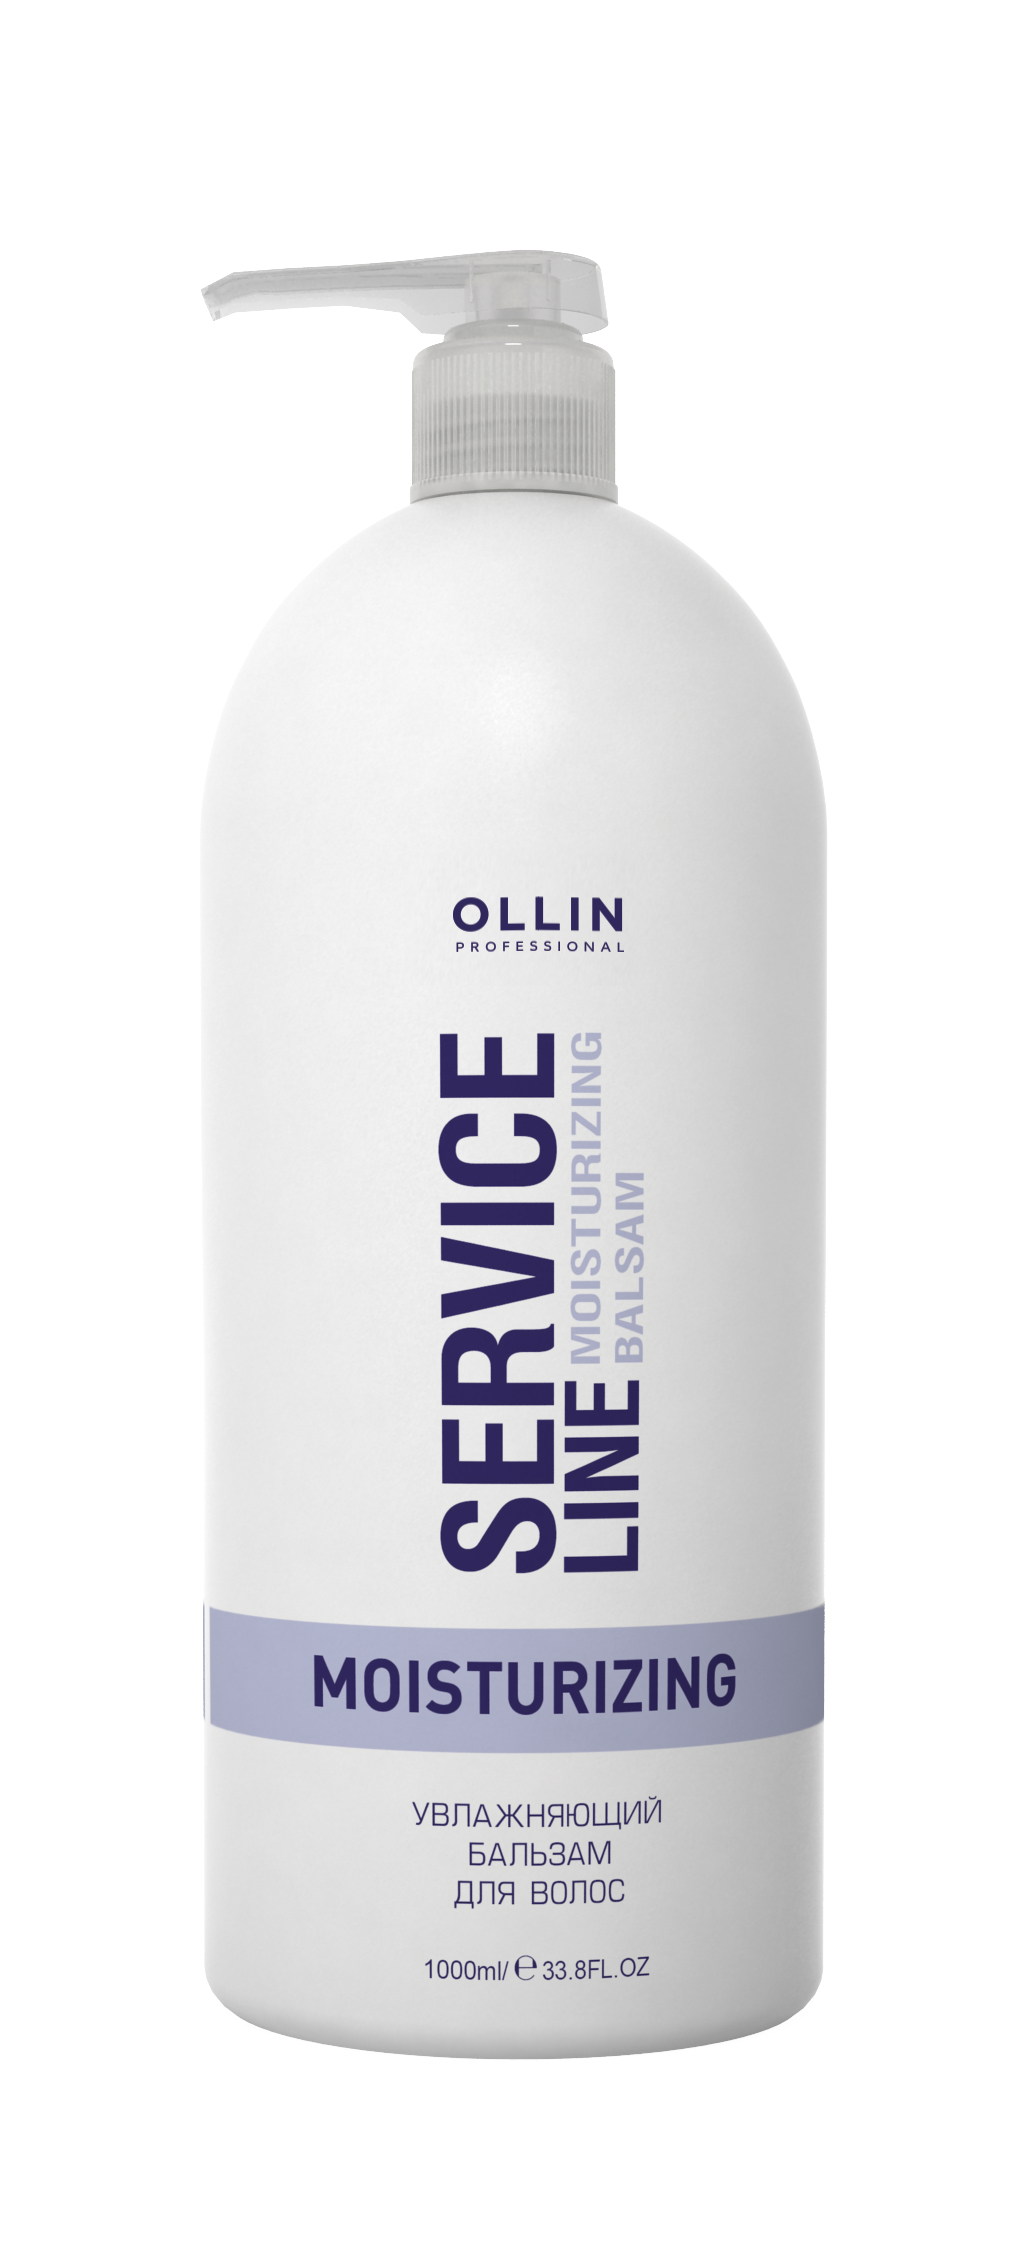 OLLIN PROFESSIONAL Бальзам увлажняющий для волос / Moisturizing balsam 1000 мл